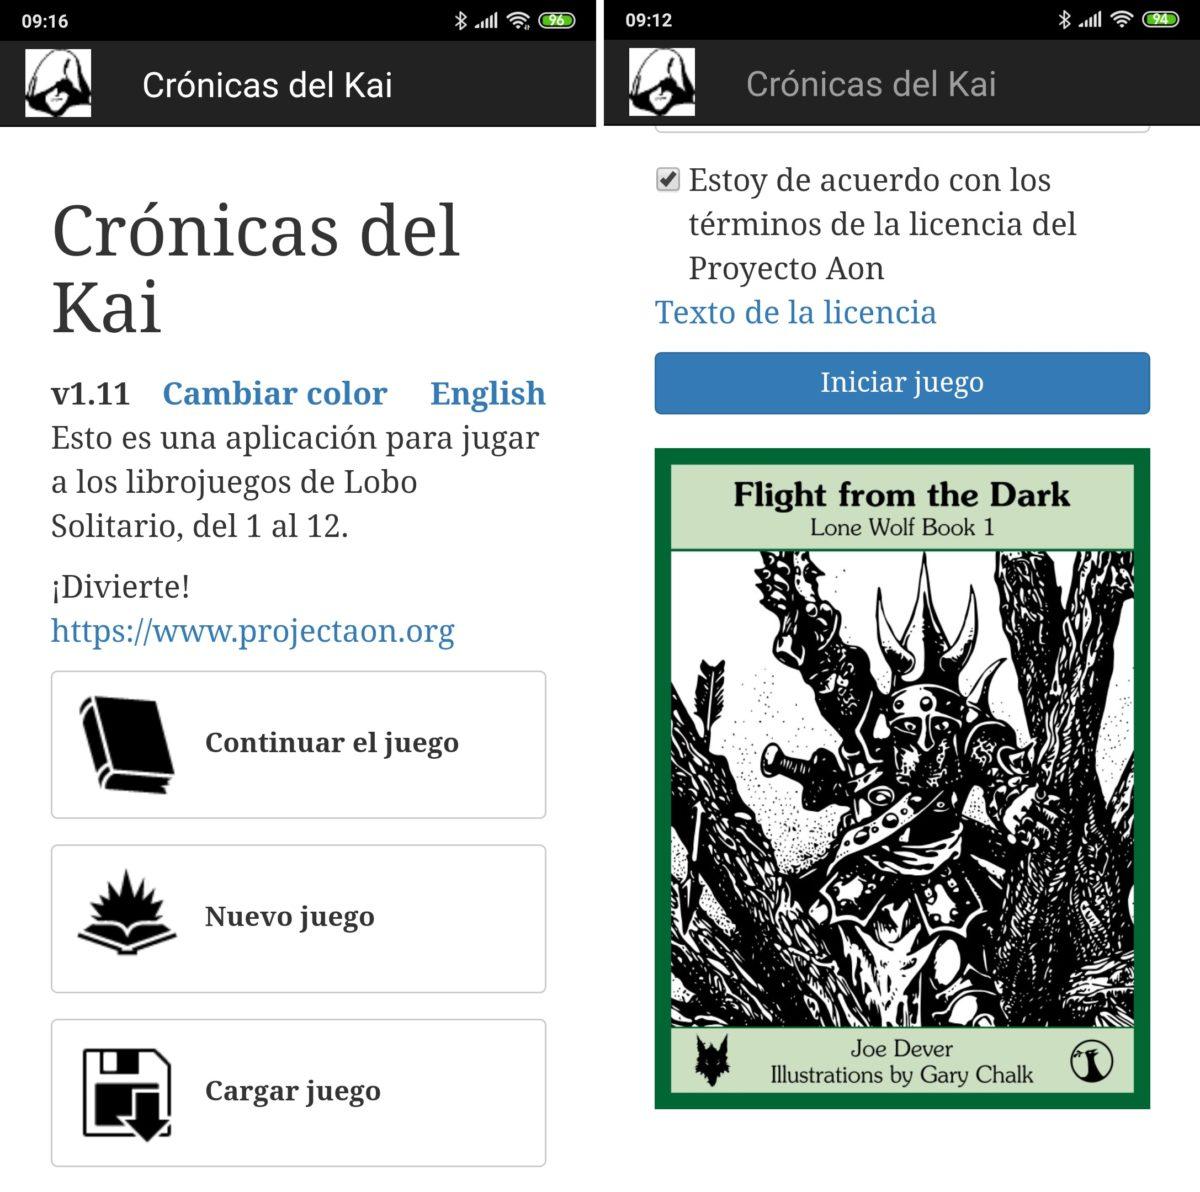 cronicas del kai